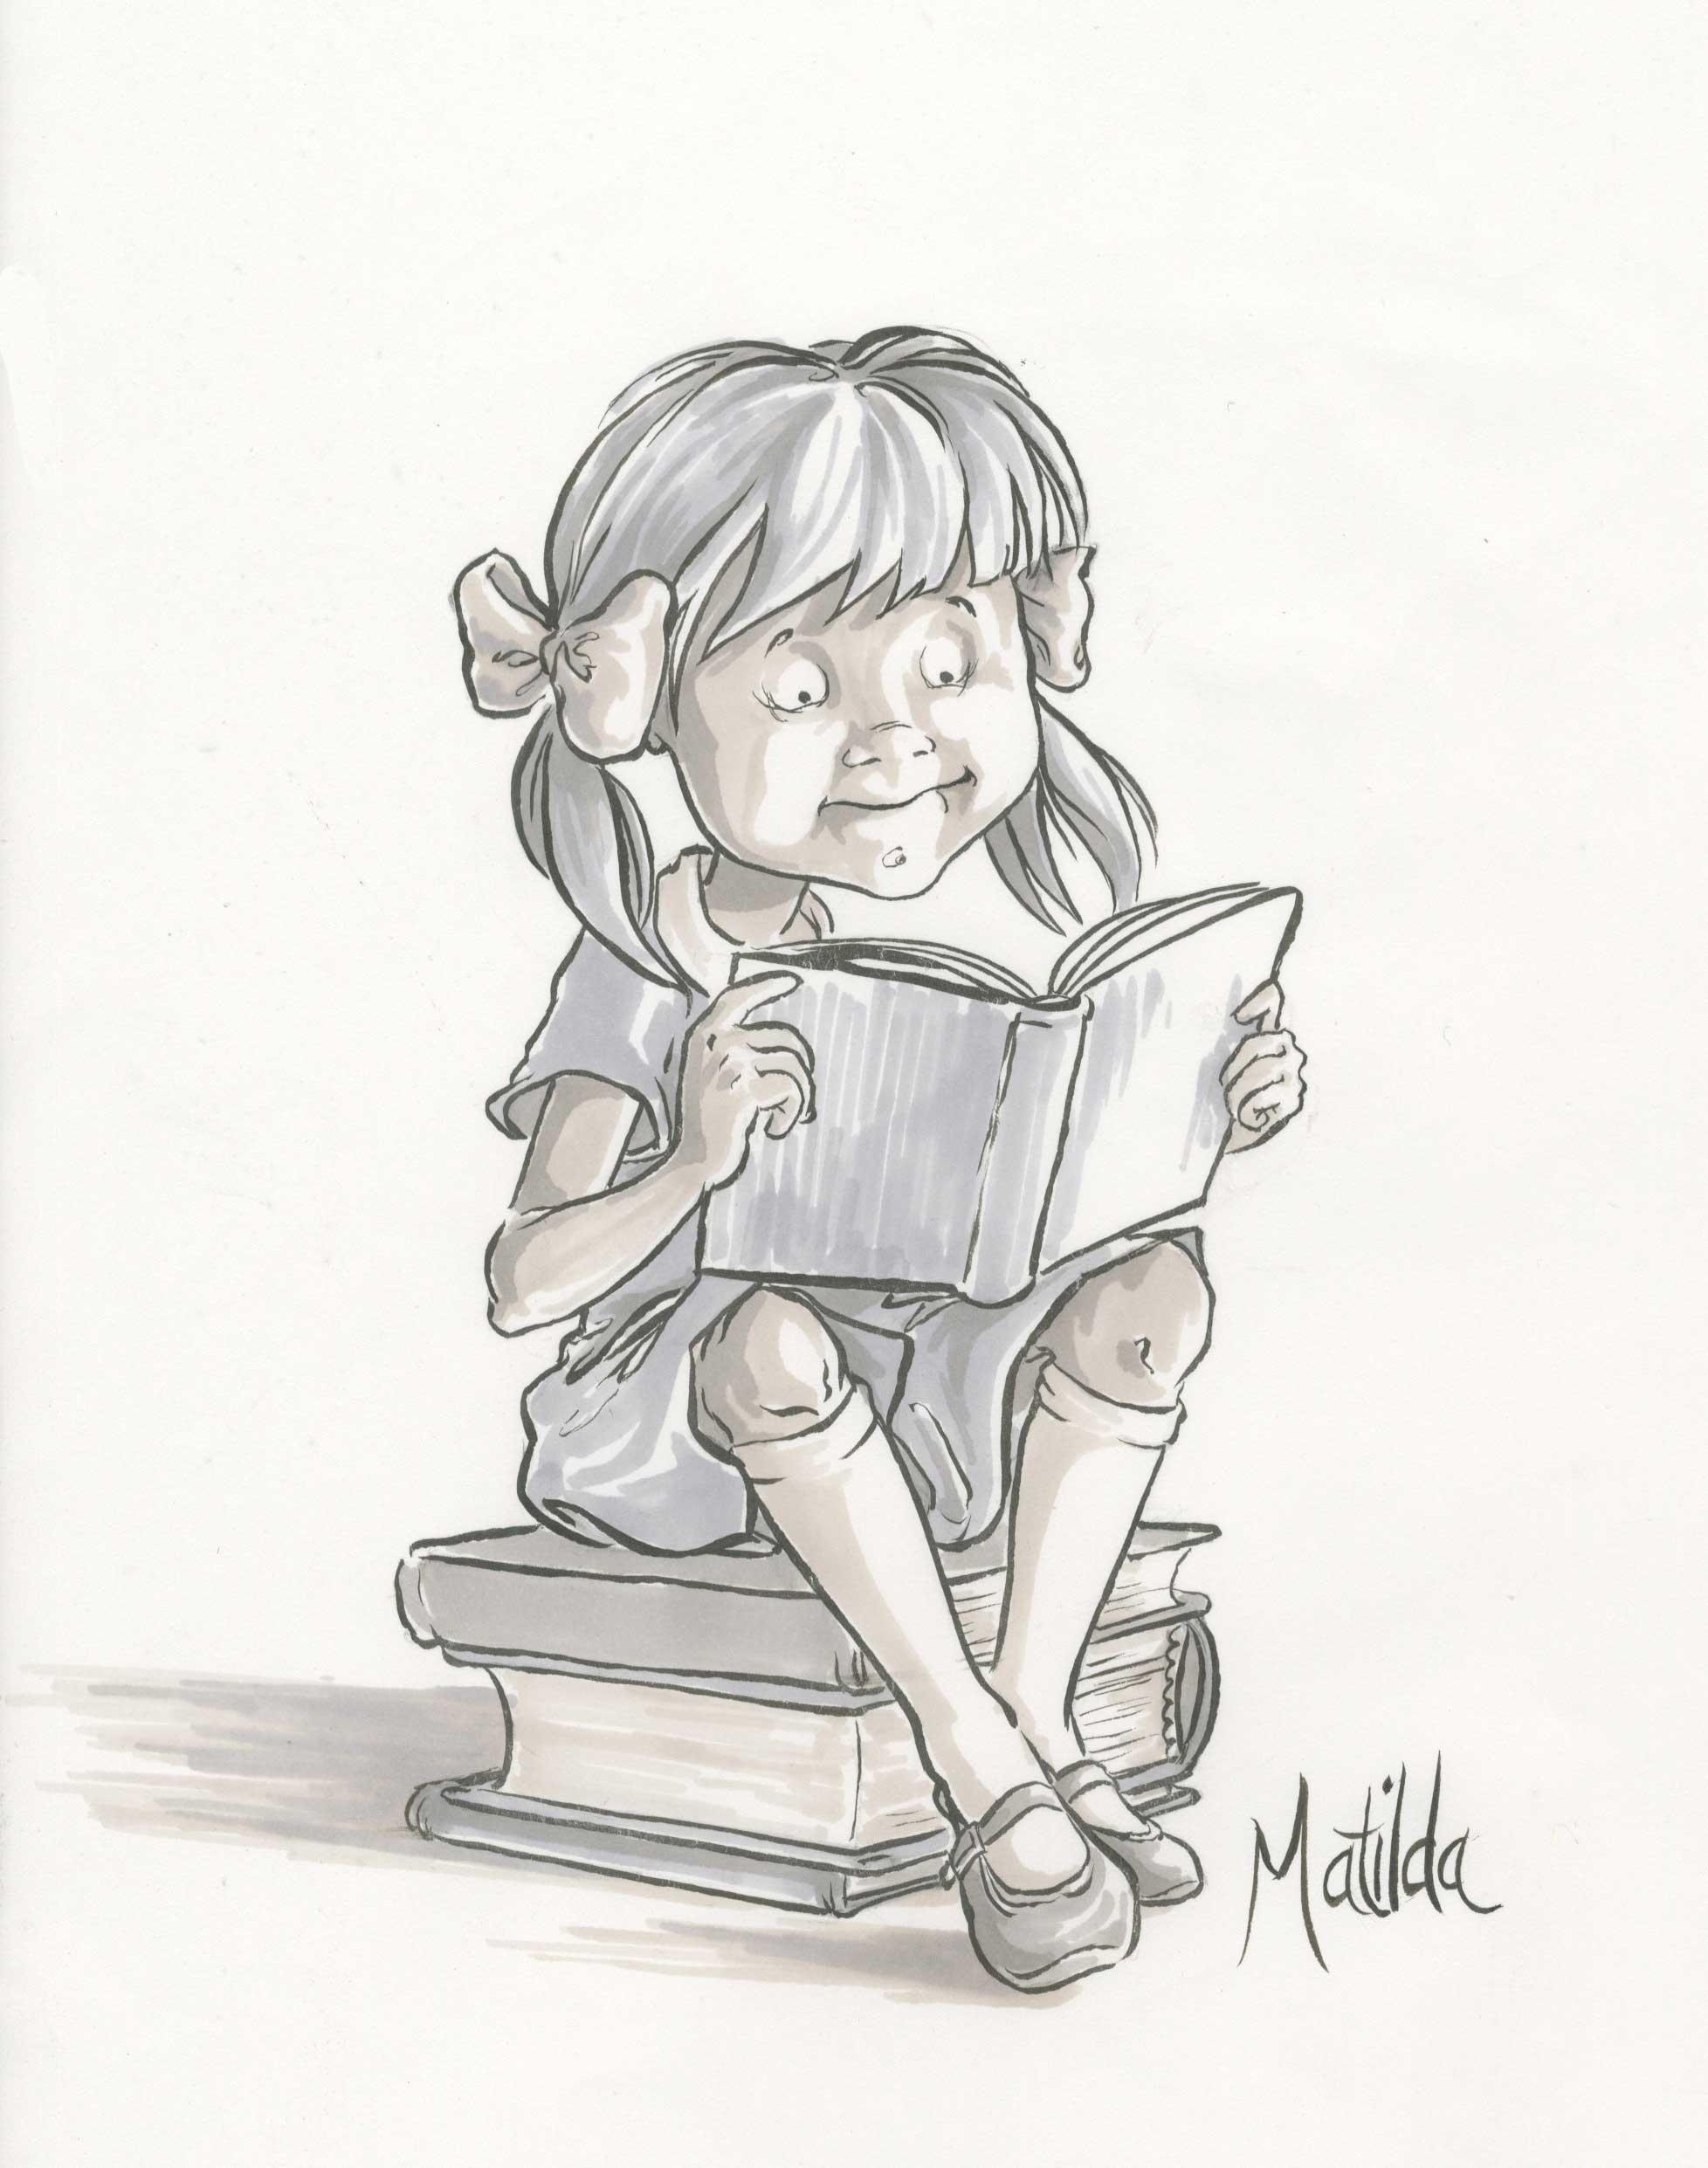 Matilda_grey.jpg